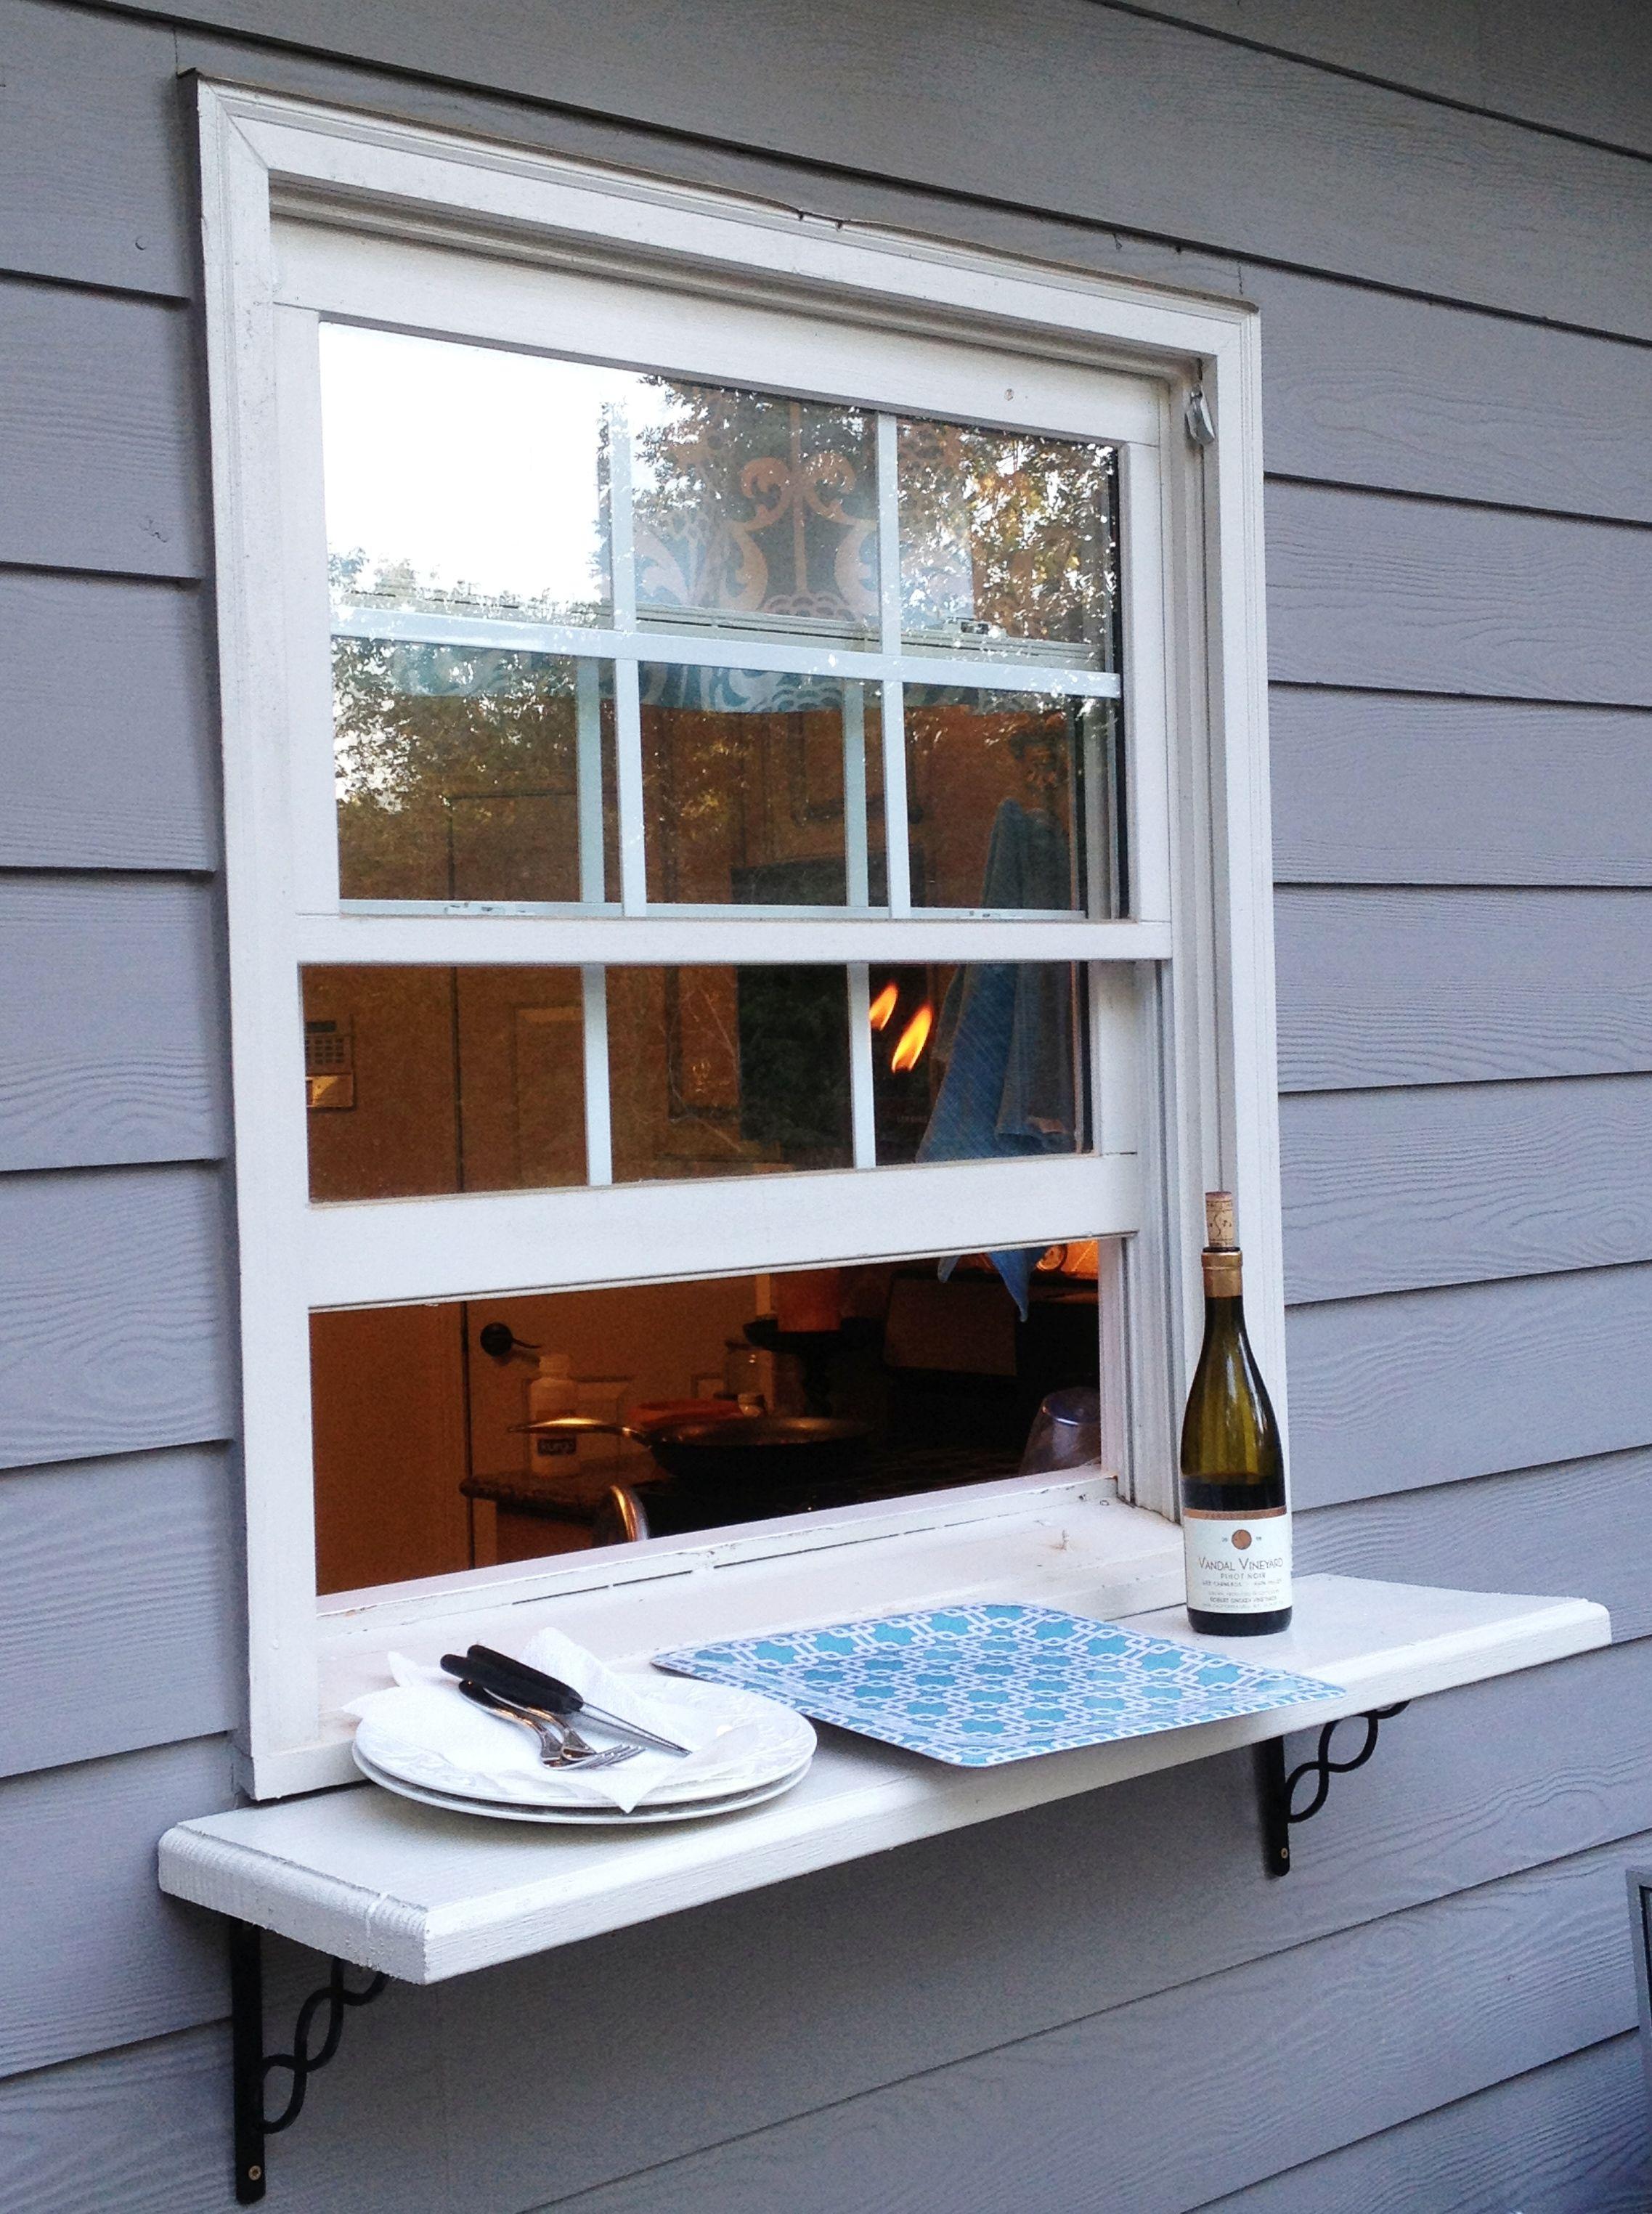 Deck Window Shelf Easy Pass Thru To The Outside From Kitchen Window Seat Kitchen Kitchen Window Bar Kitchen Window Shelves